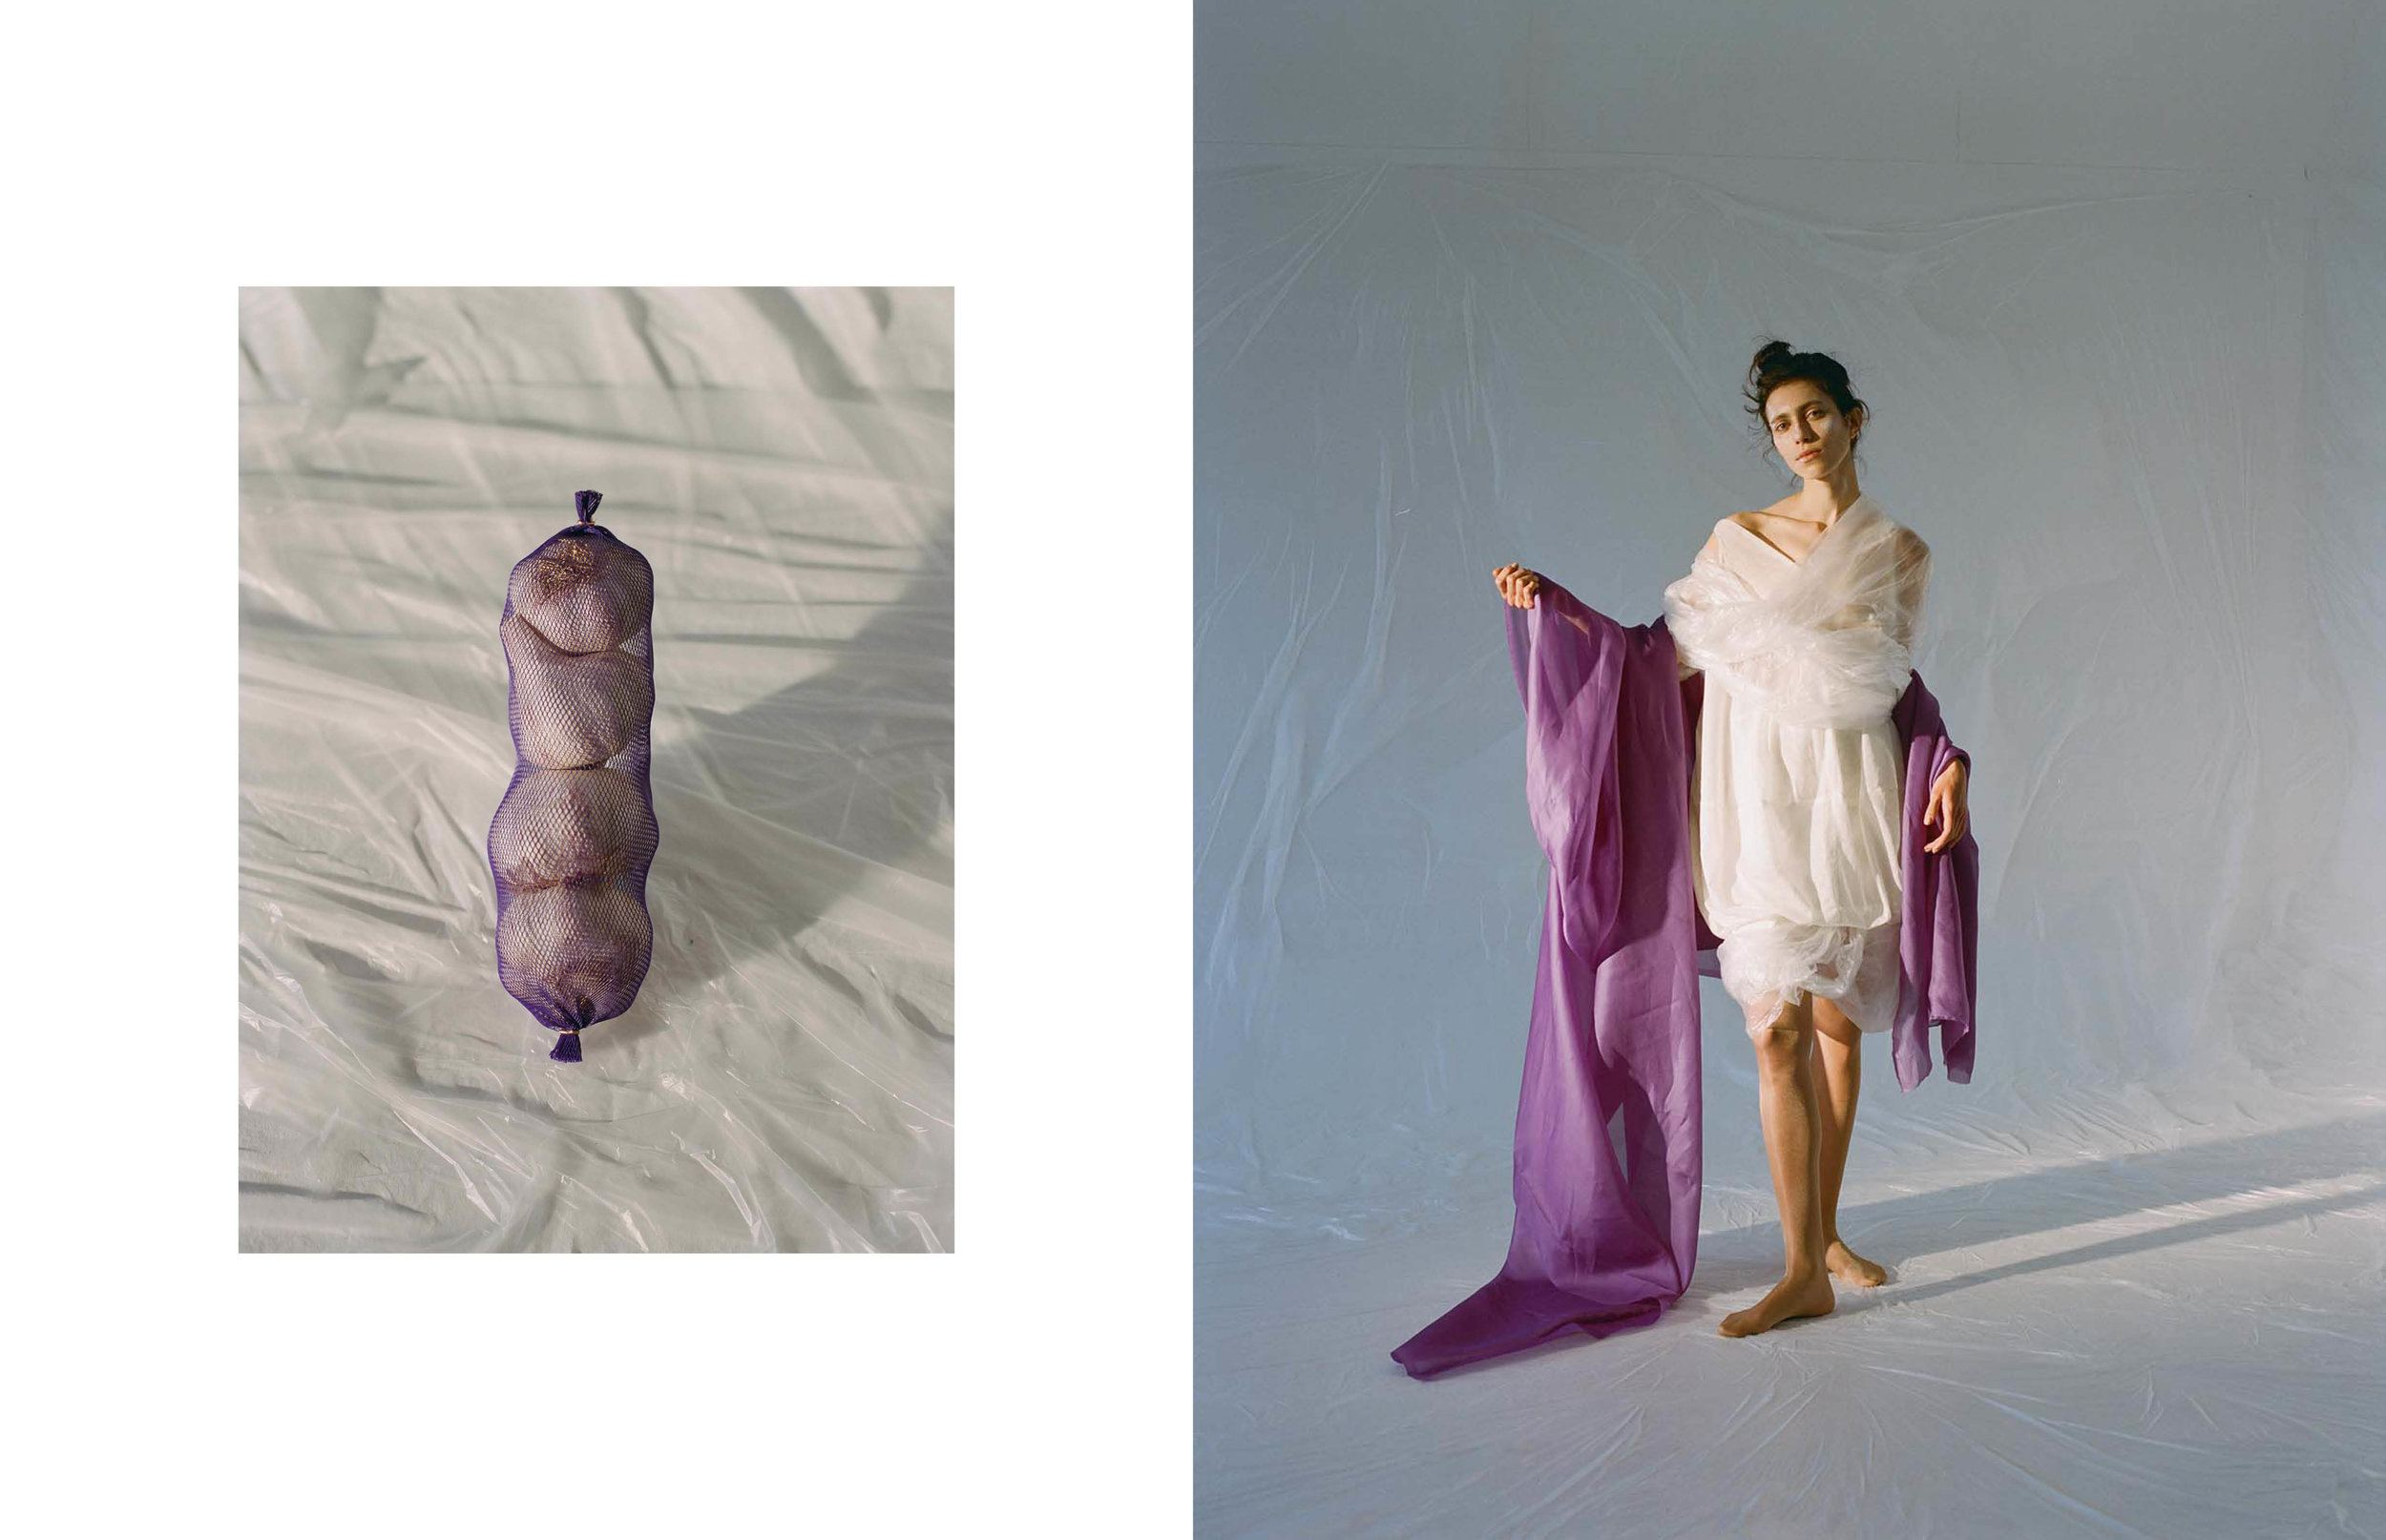 IGNANT-Photography-Olga-de-la-Iglesias-2